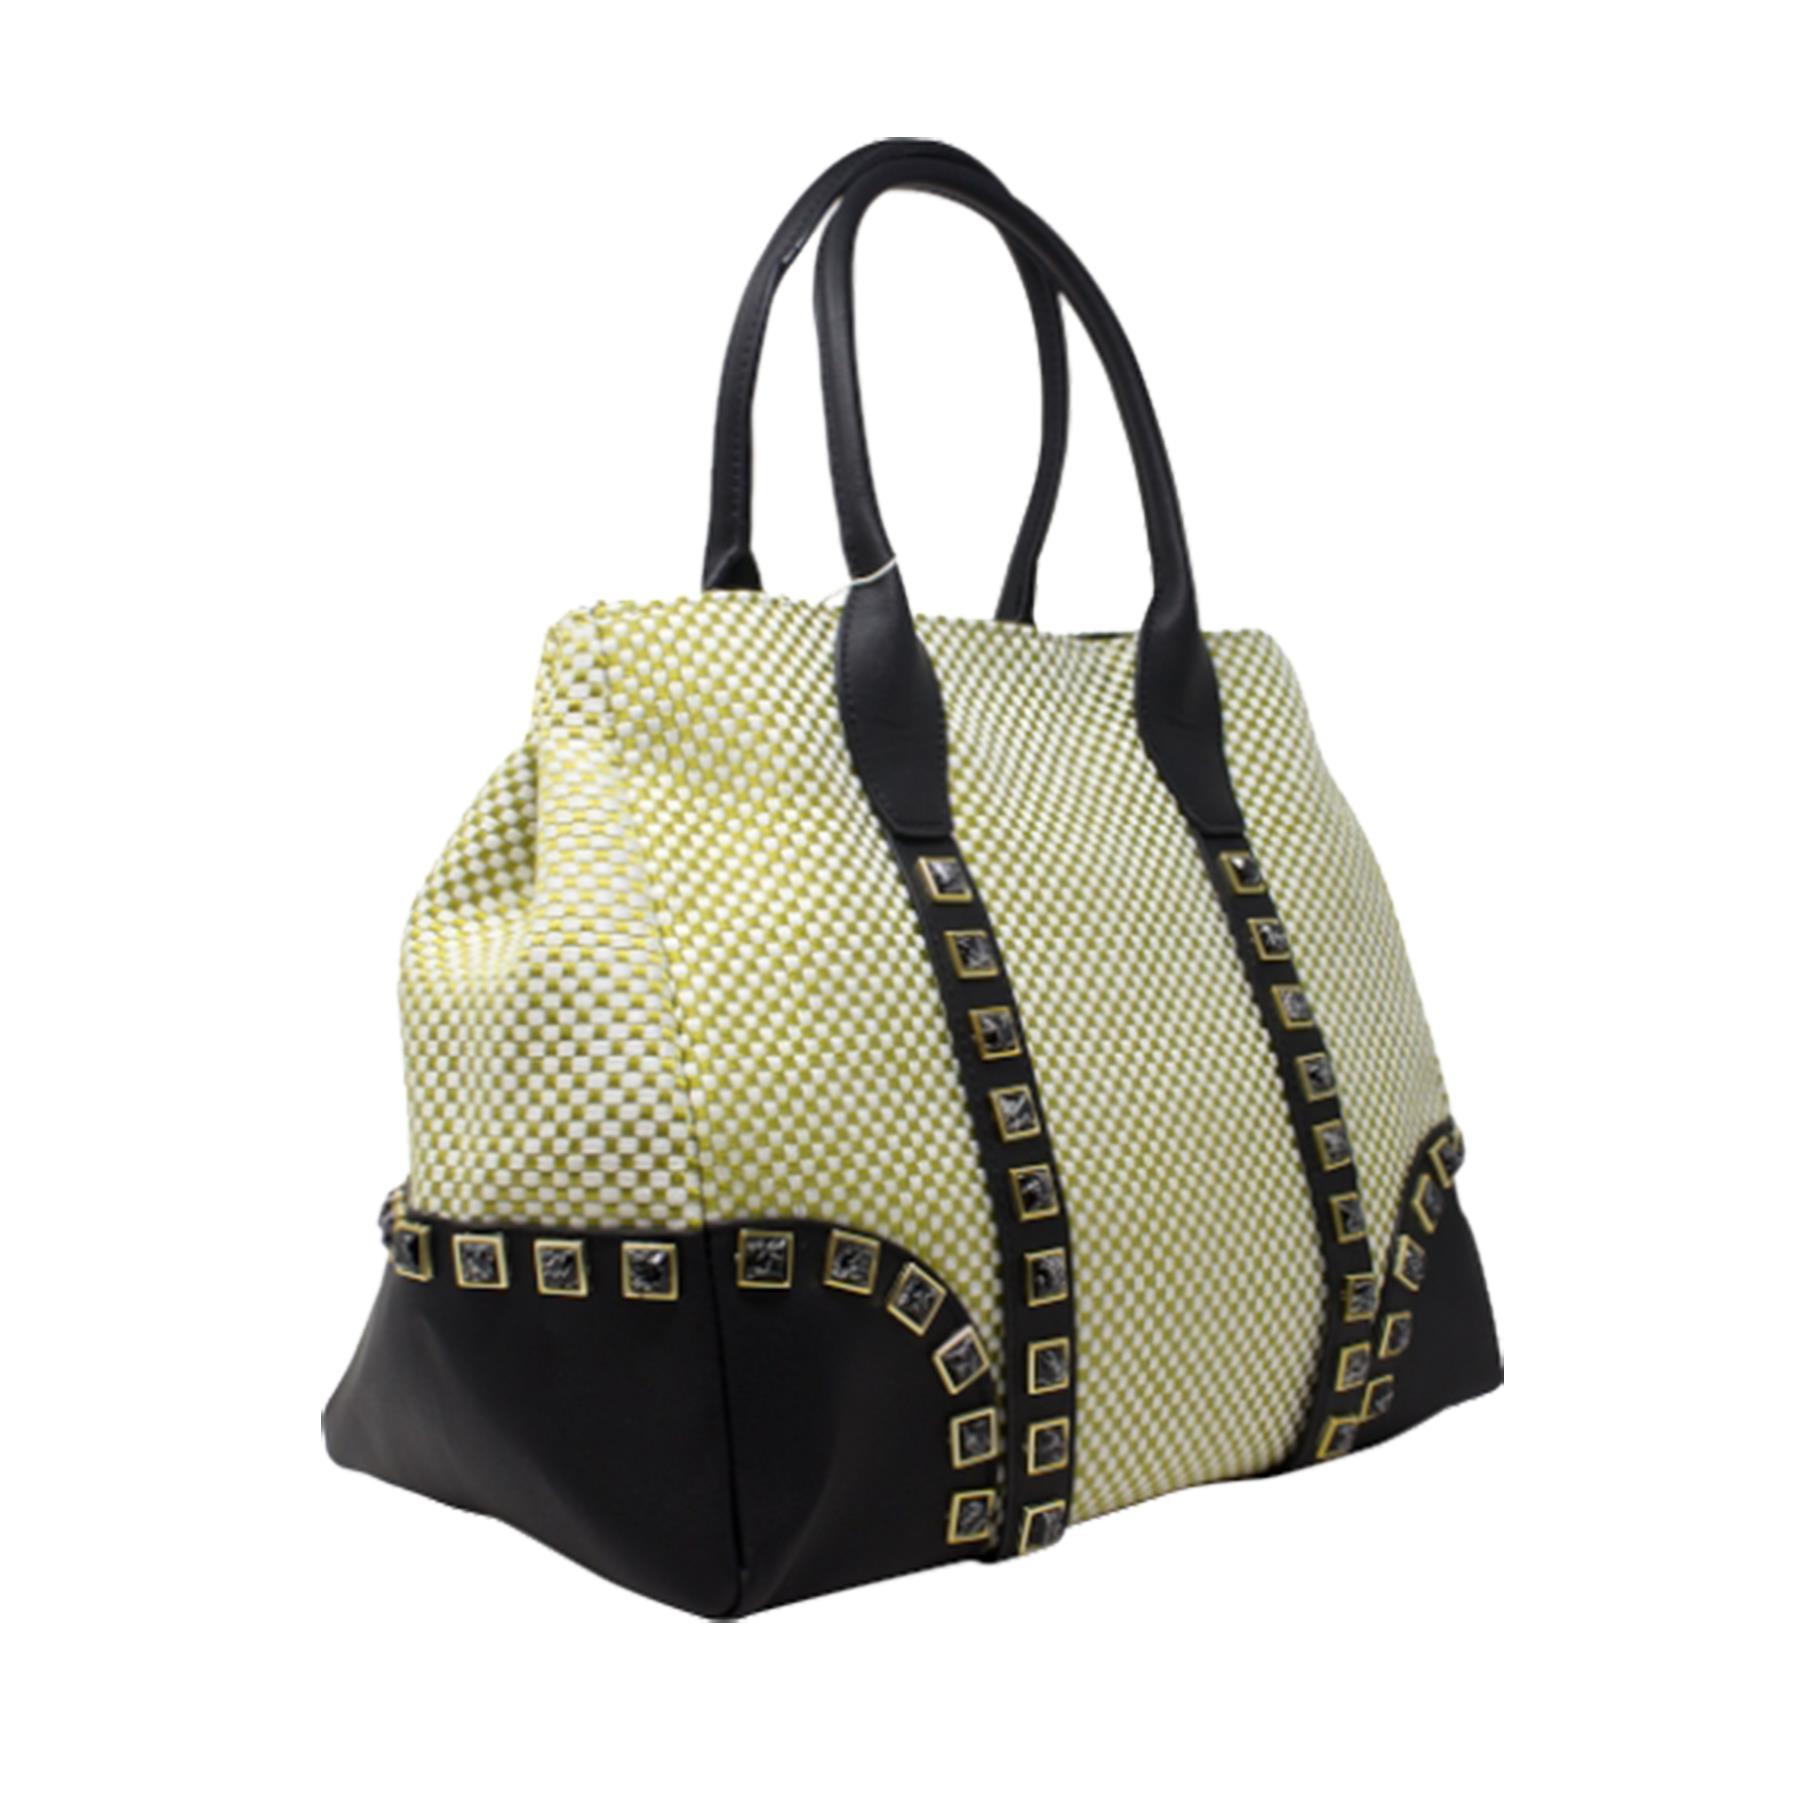 New-Women-s-Small-Check-Pattern-Studded-Design-Tote-Bag-Handbag thumbnail 11